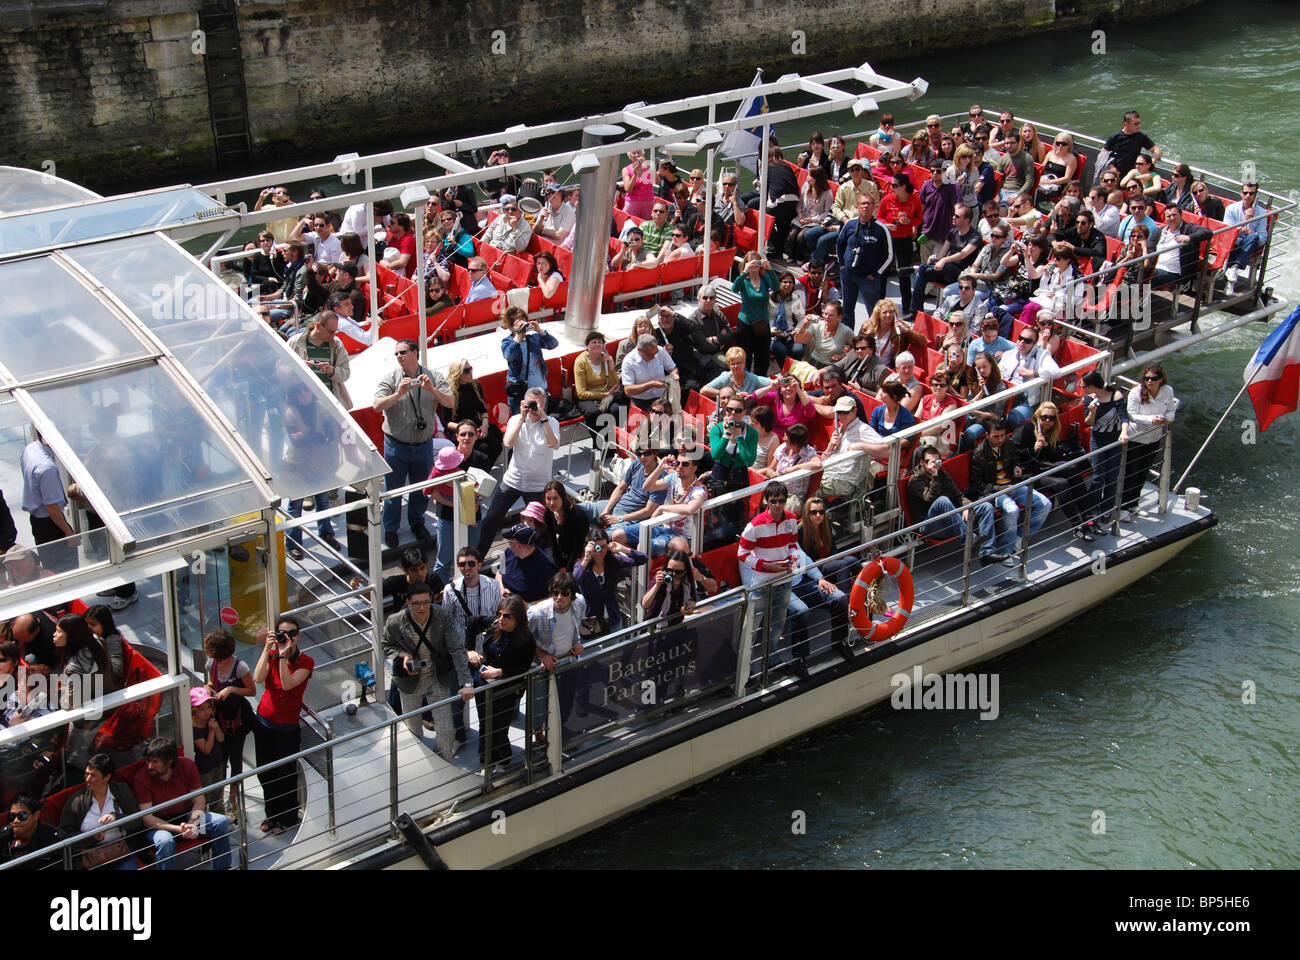 boat trip on the Seine, Paris France - Stock Image